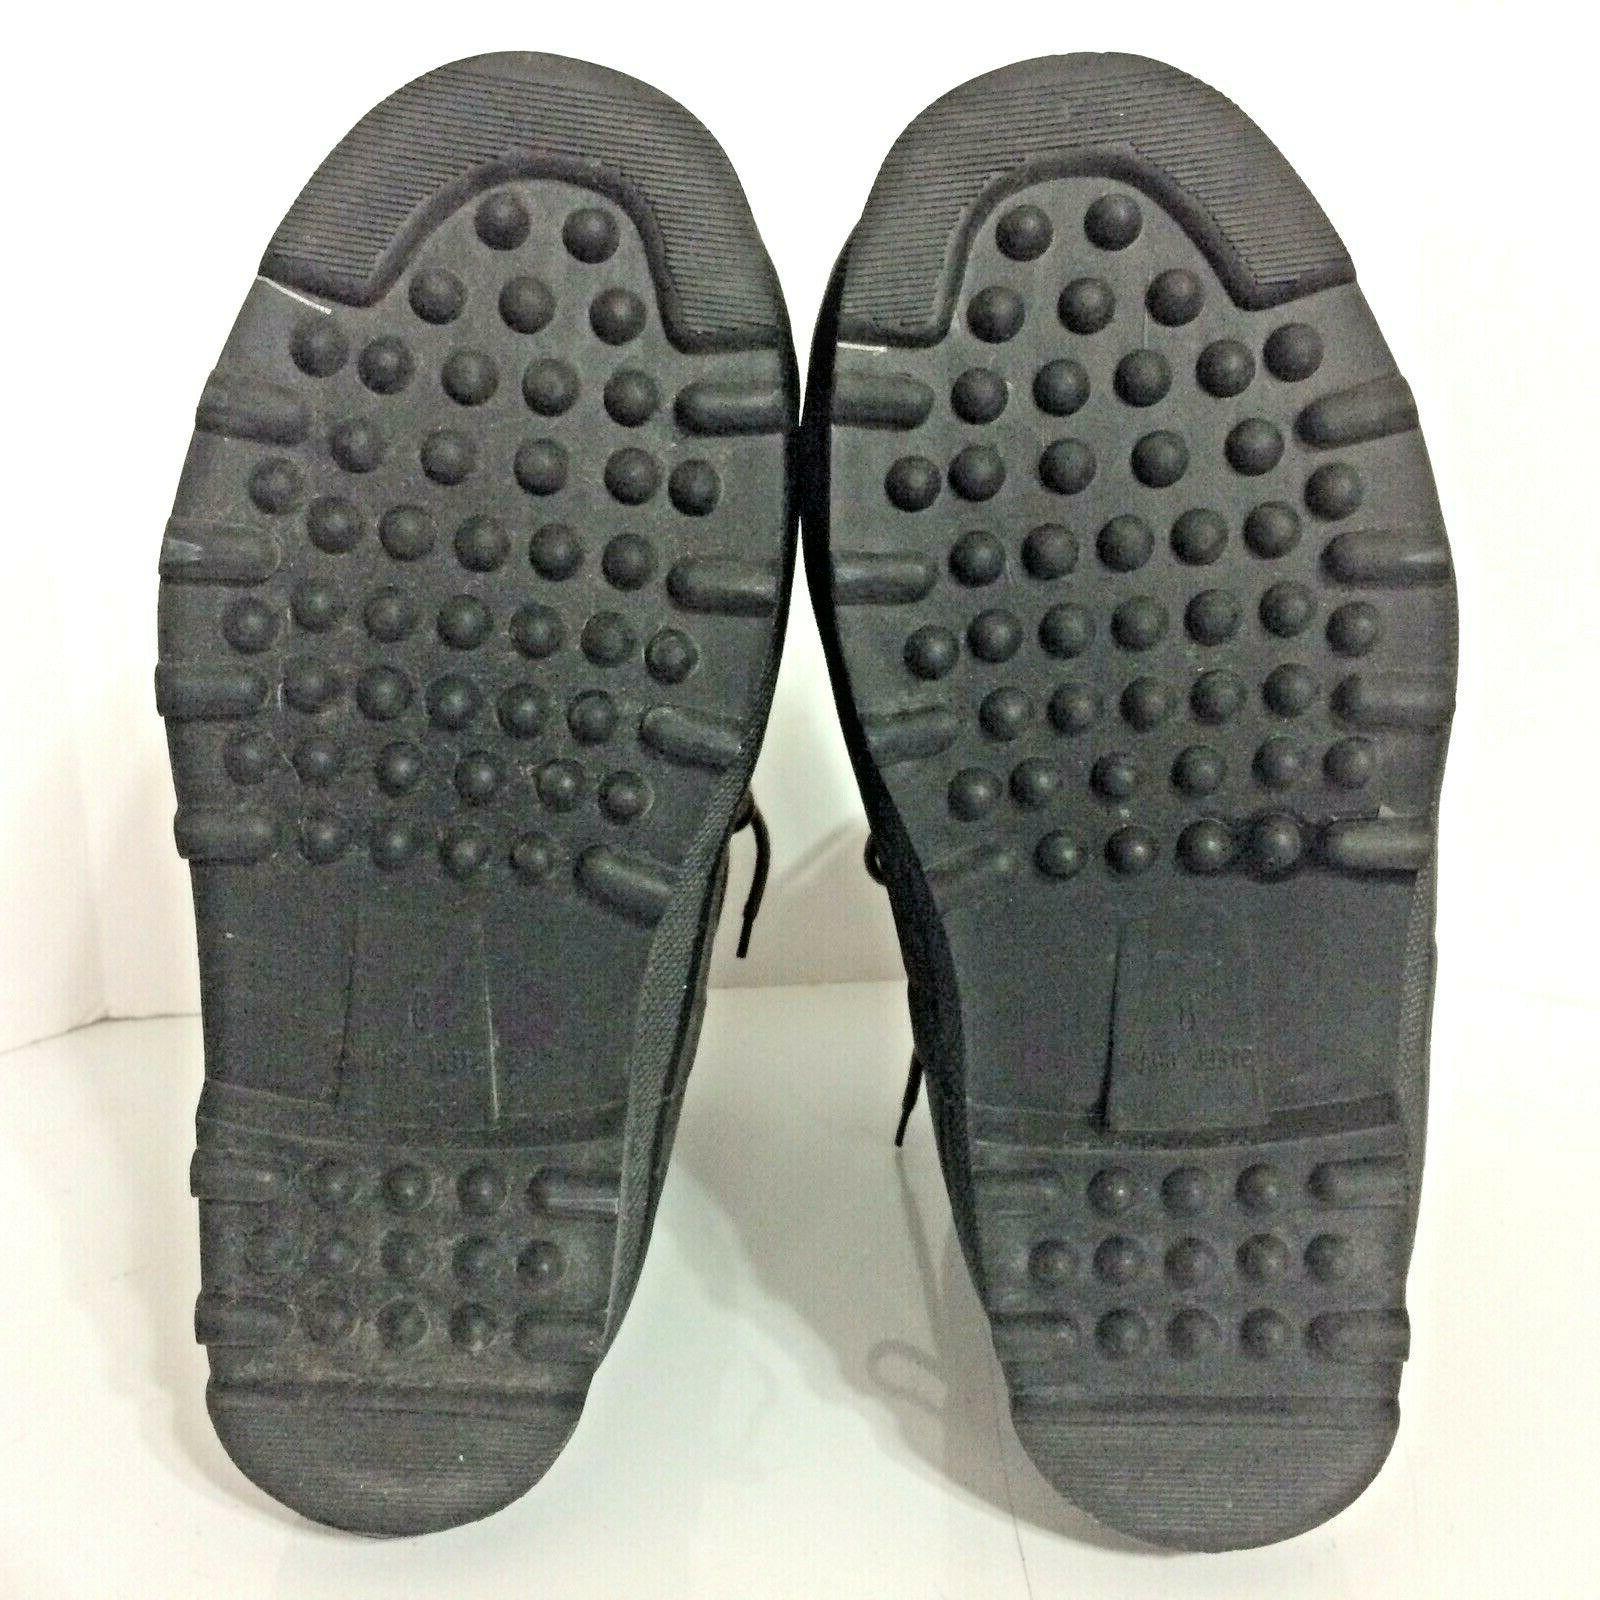 NEW Gear Tinsulate Waterproof Hiking Boots - 8